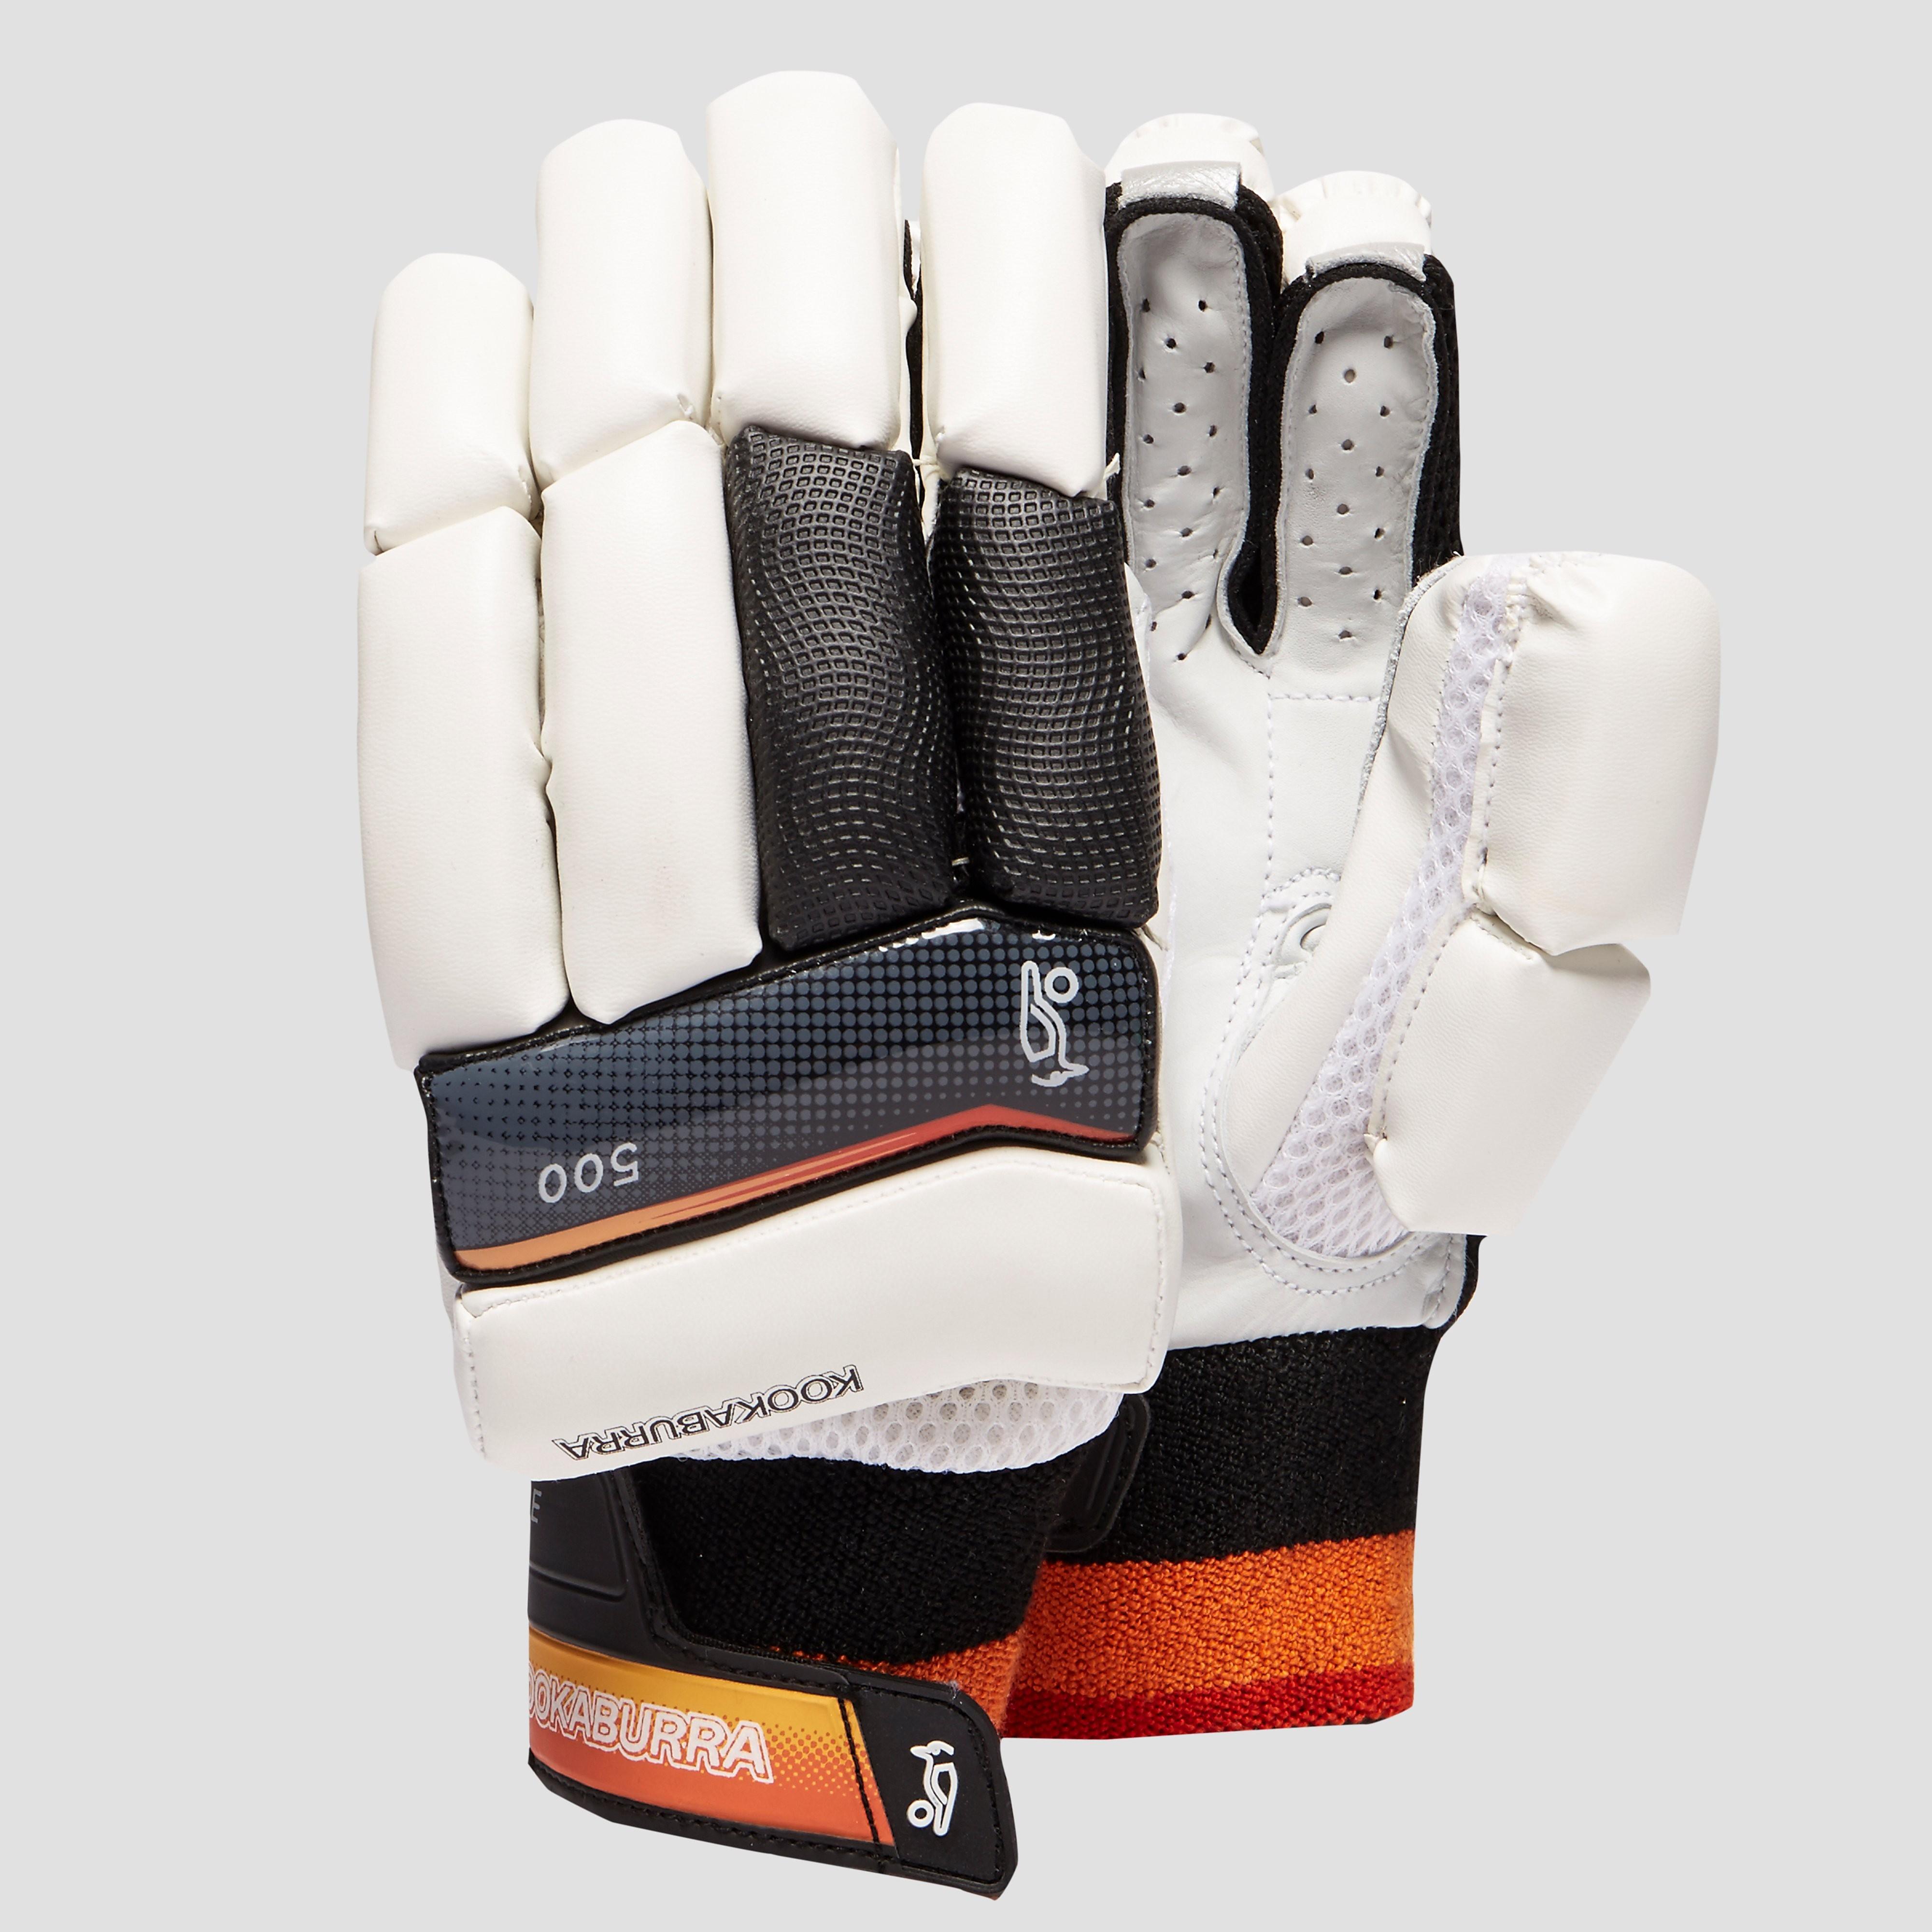 Kookaburra Blaze 500 Junior Cricket Batting Gloves